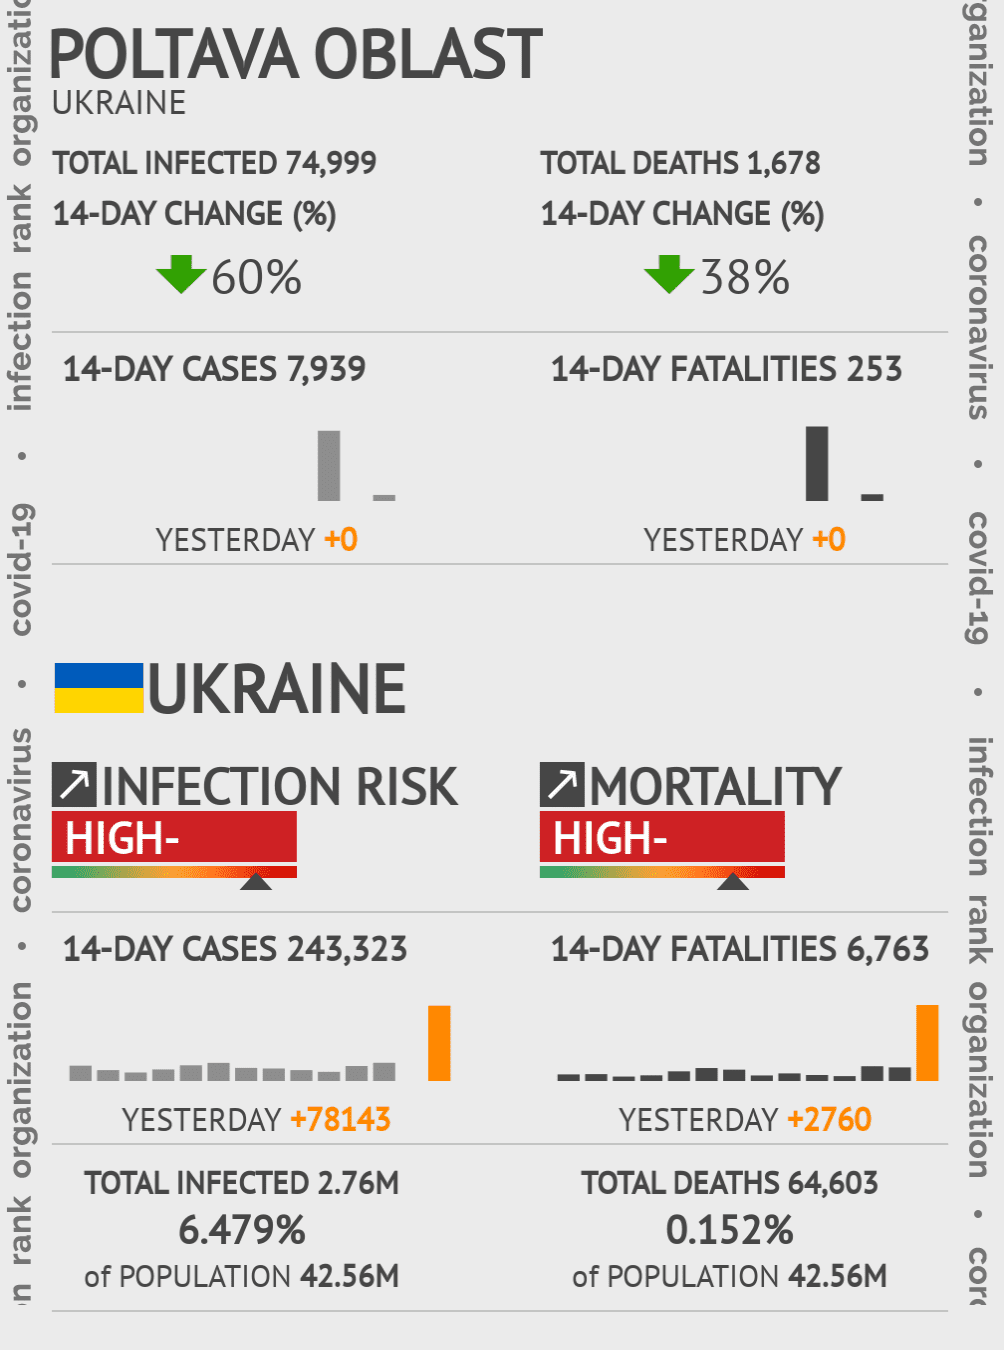 Poltava Oblast Coronavirus Covid-19 Risk of Infection on March 03, 2021